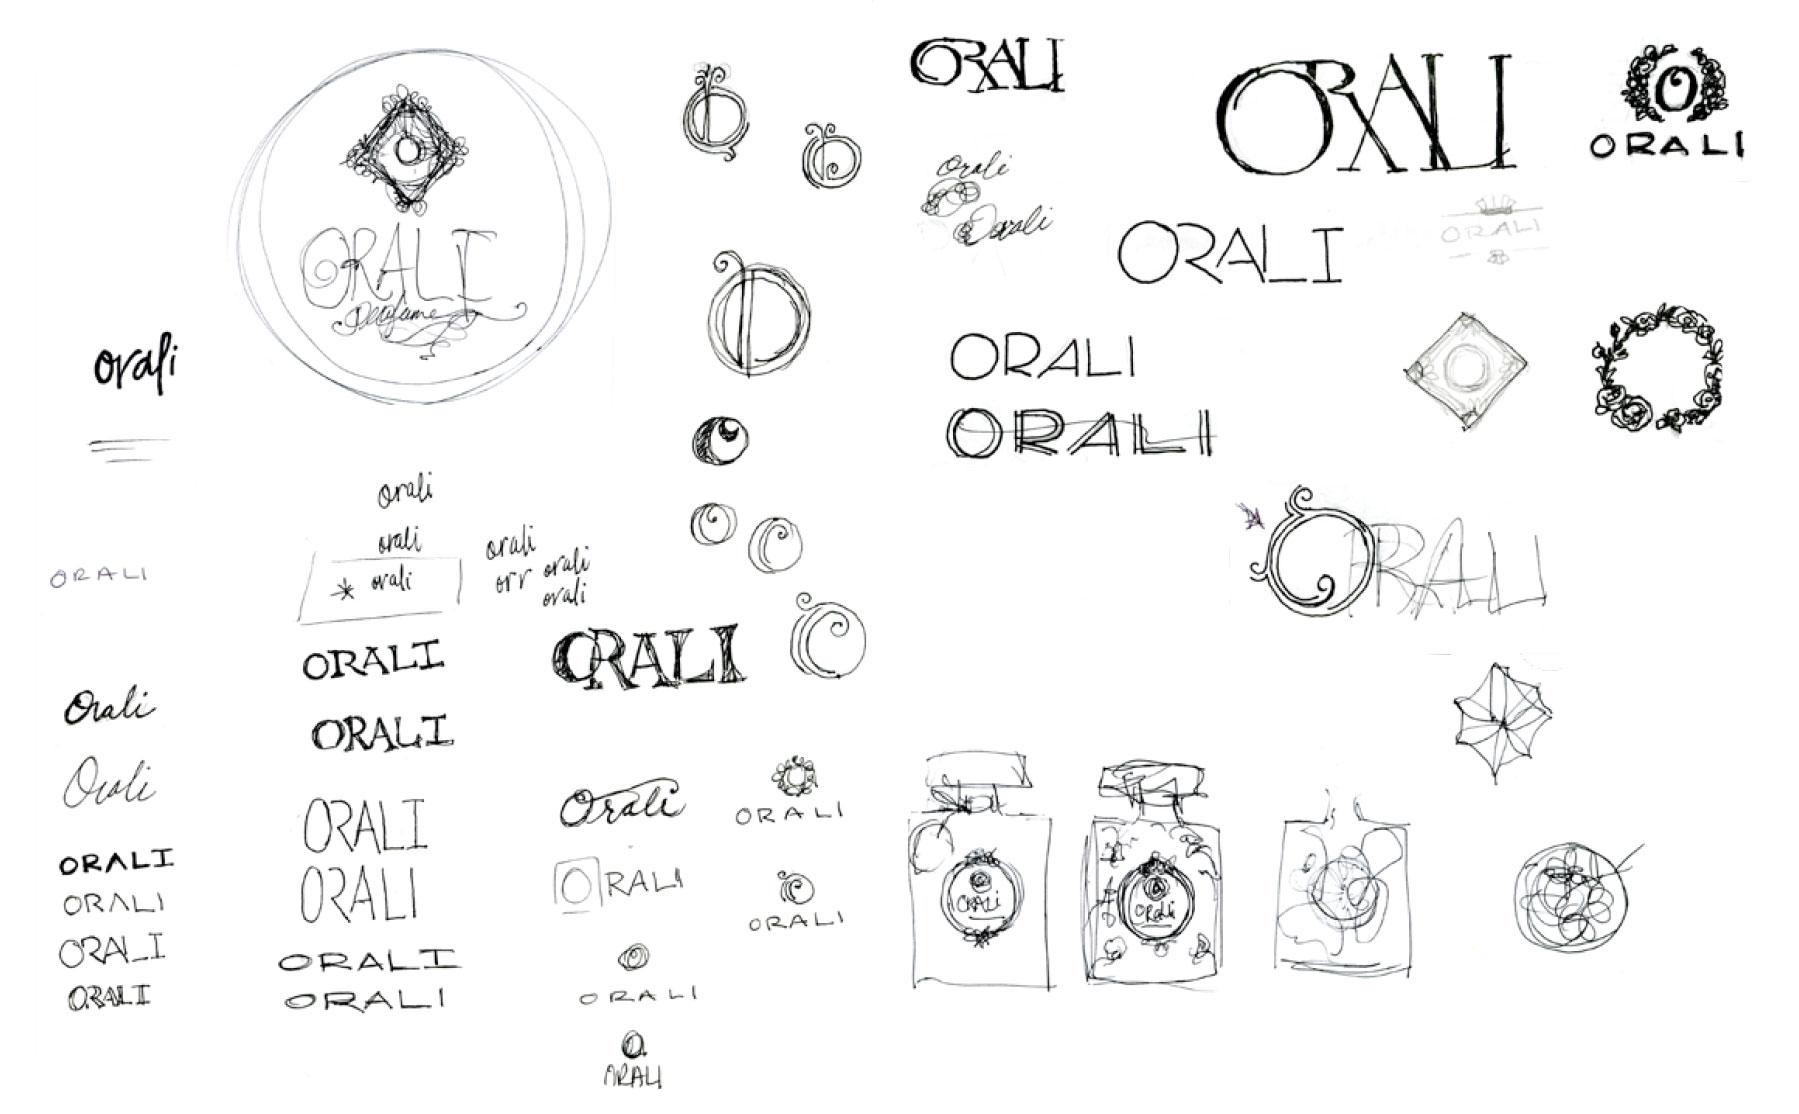 ceci_johnson_ceci_new_york_orali_perfume_custom_branding_logo_design_business_collateral_illustration_v242_01